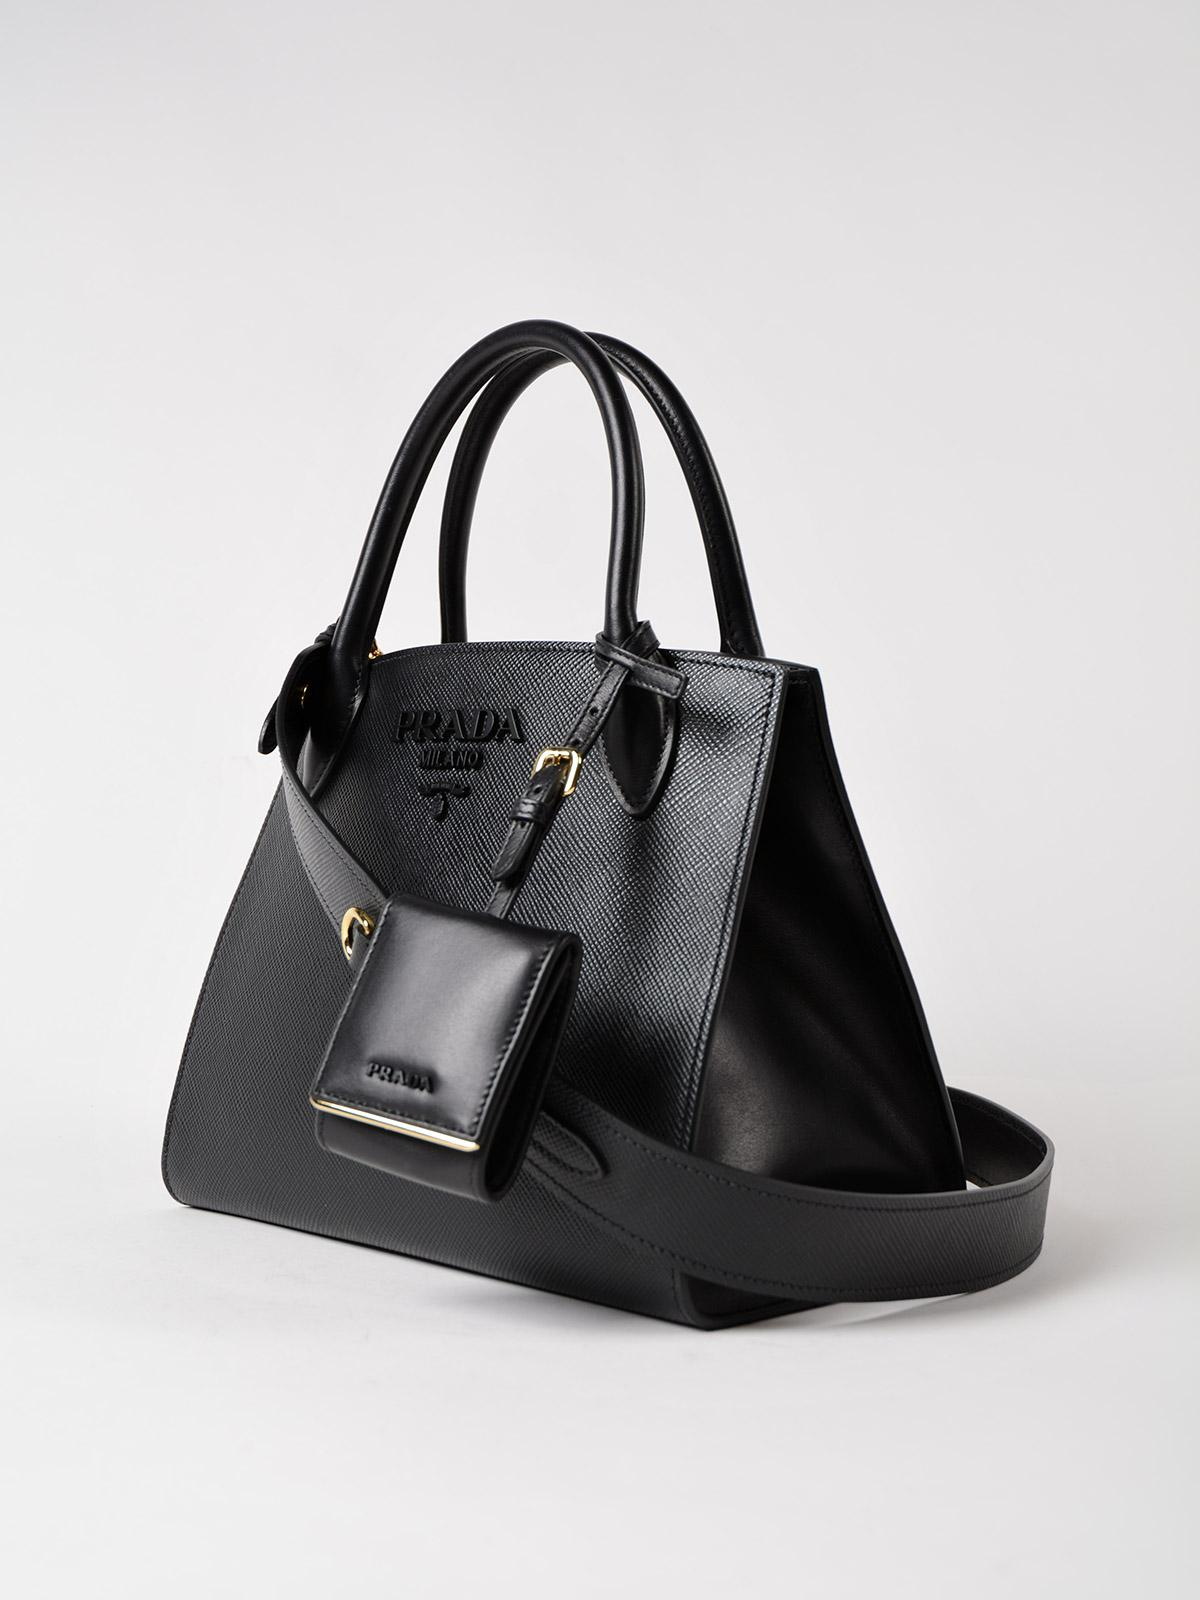 20e47431f37a Lyst - Prada Saff.cuir+city Calf Monochrome Bag in Black